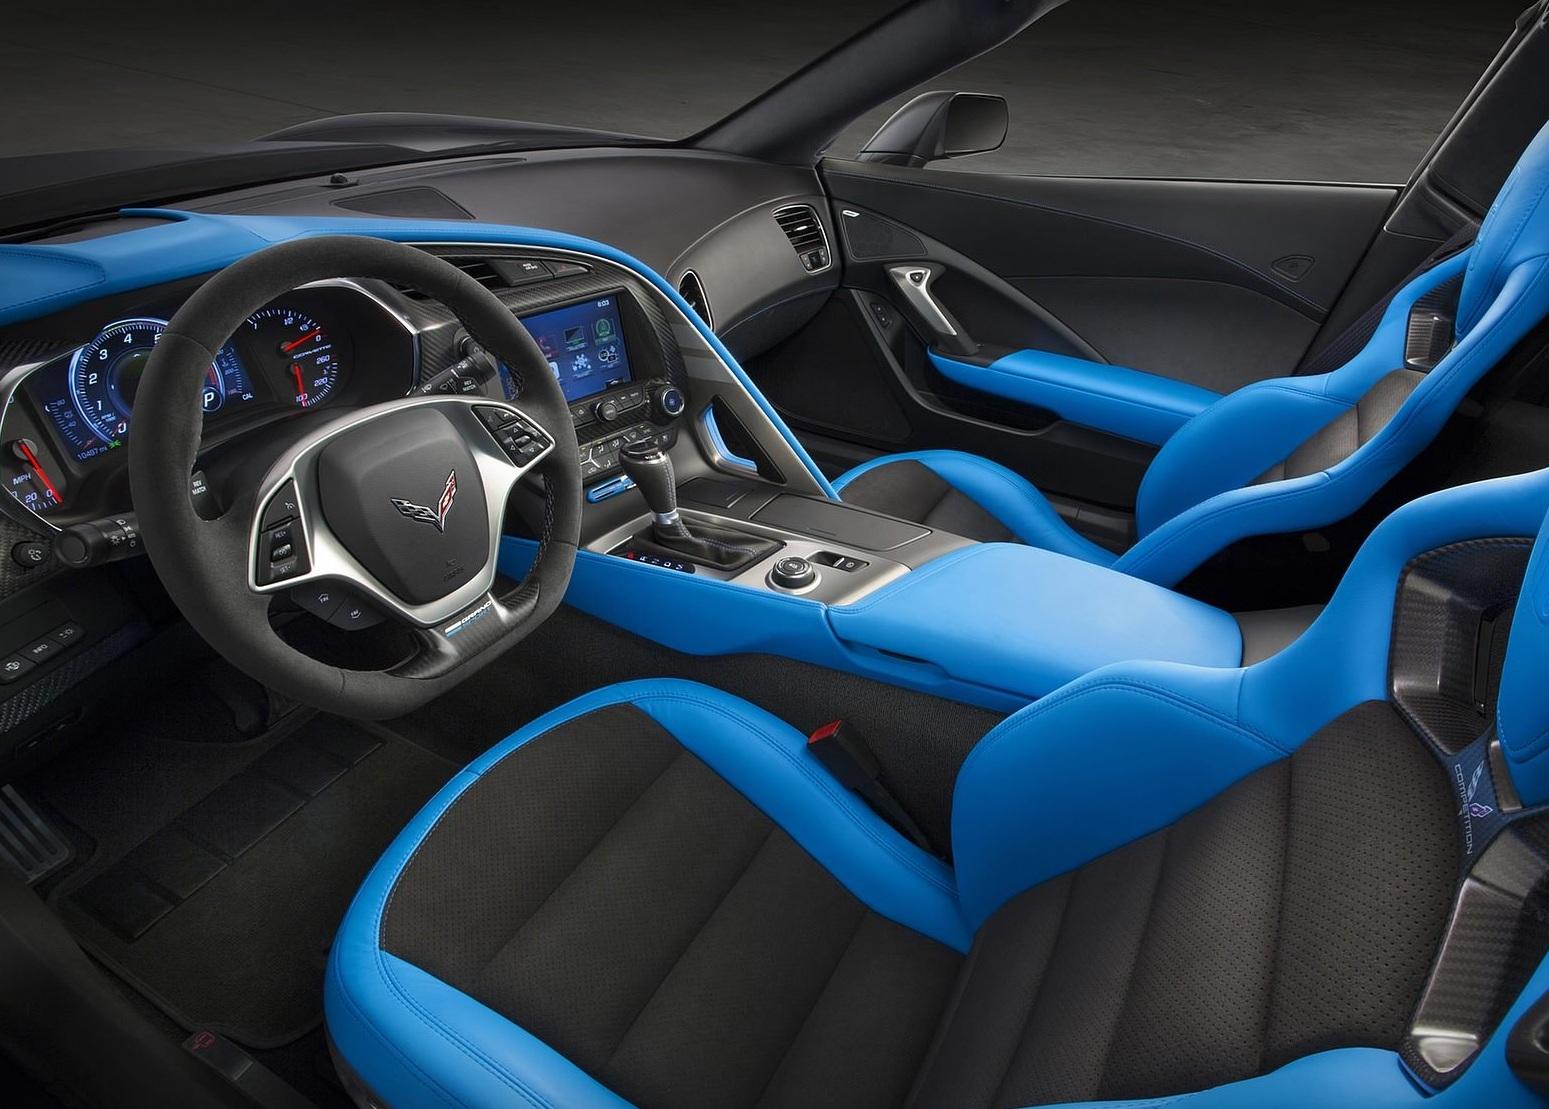 2017 Chevrolet Corvette Grand Sport Interior